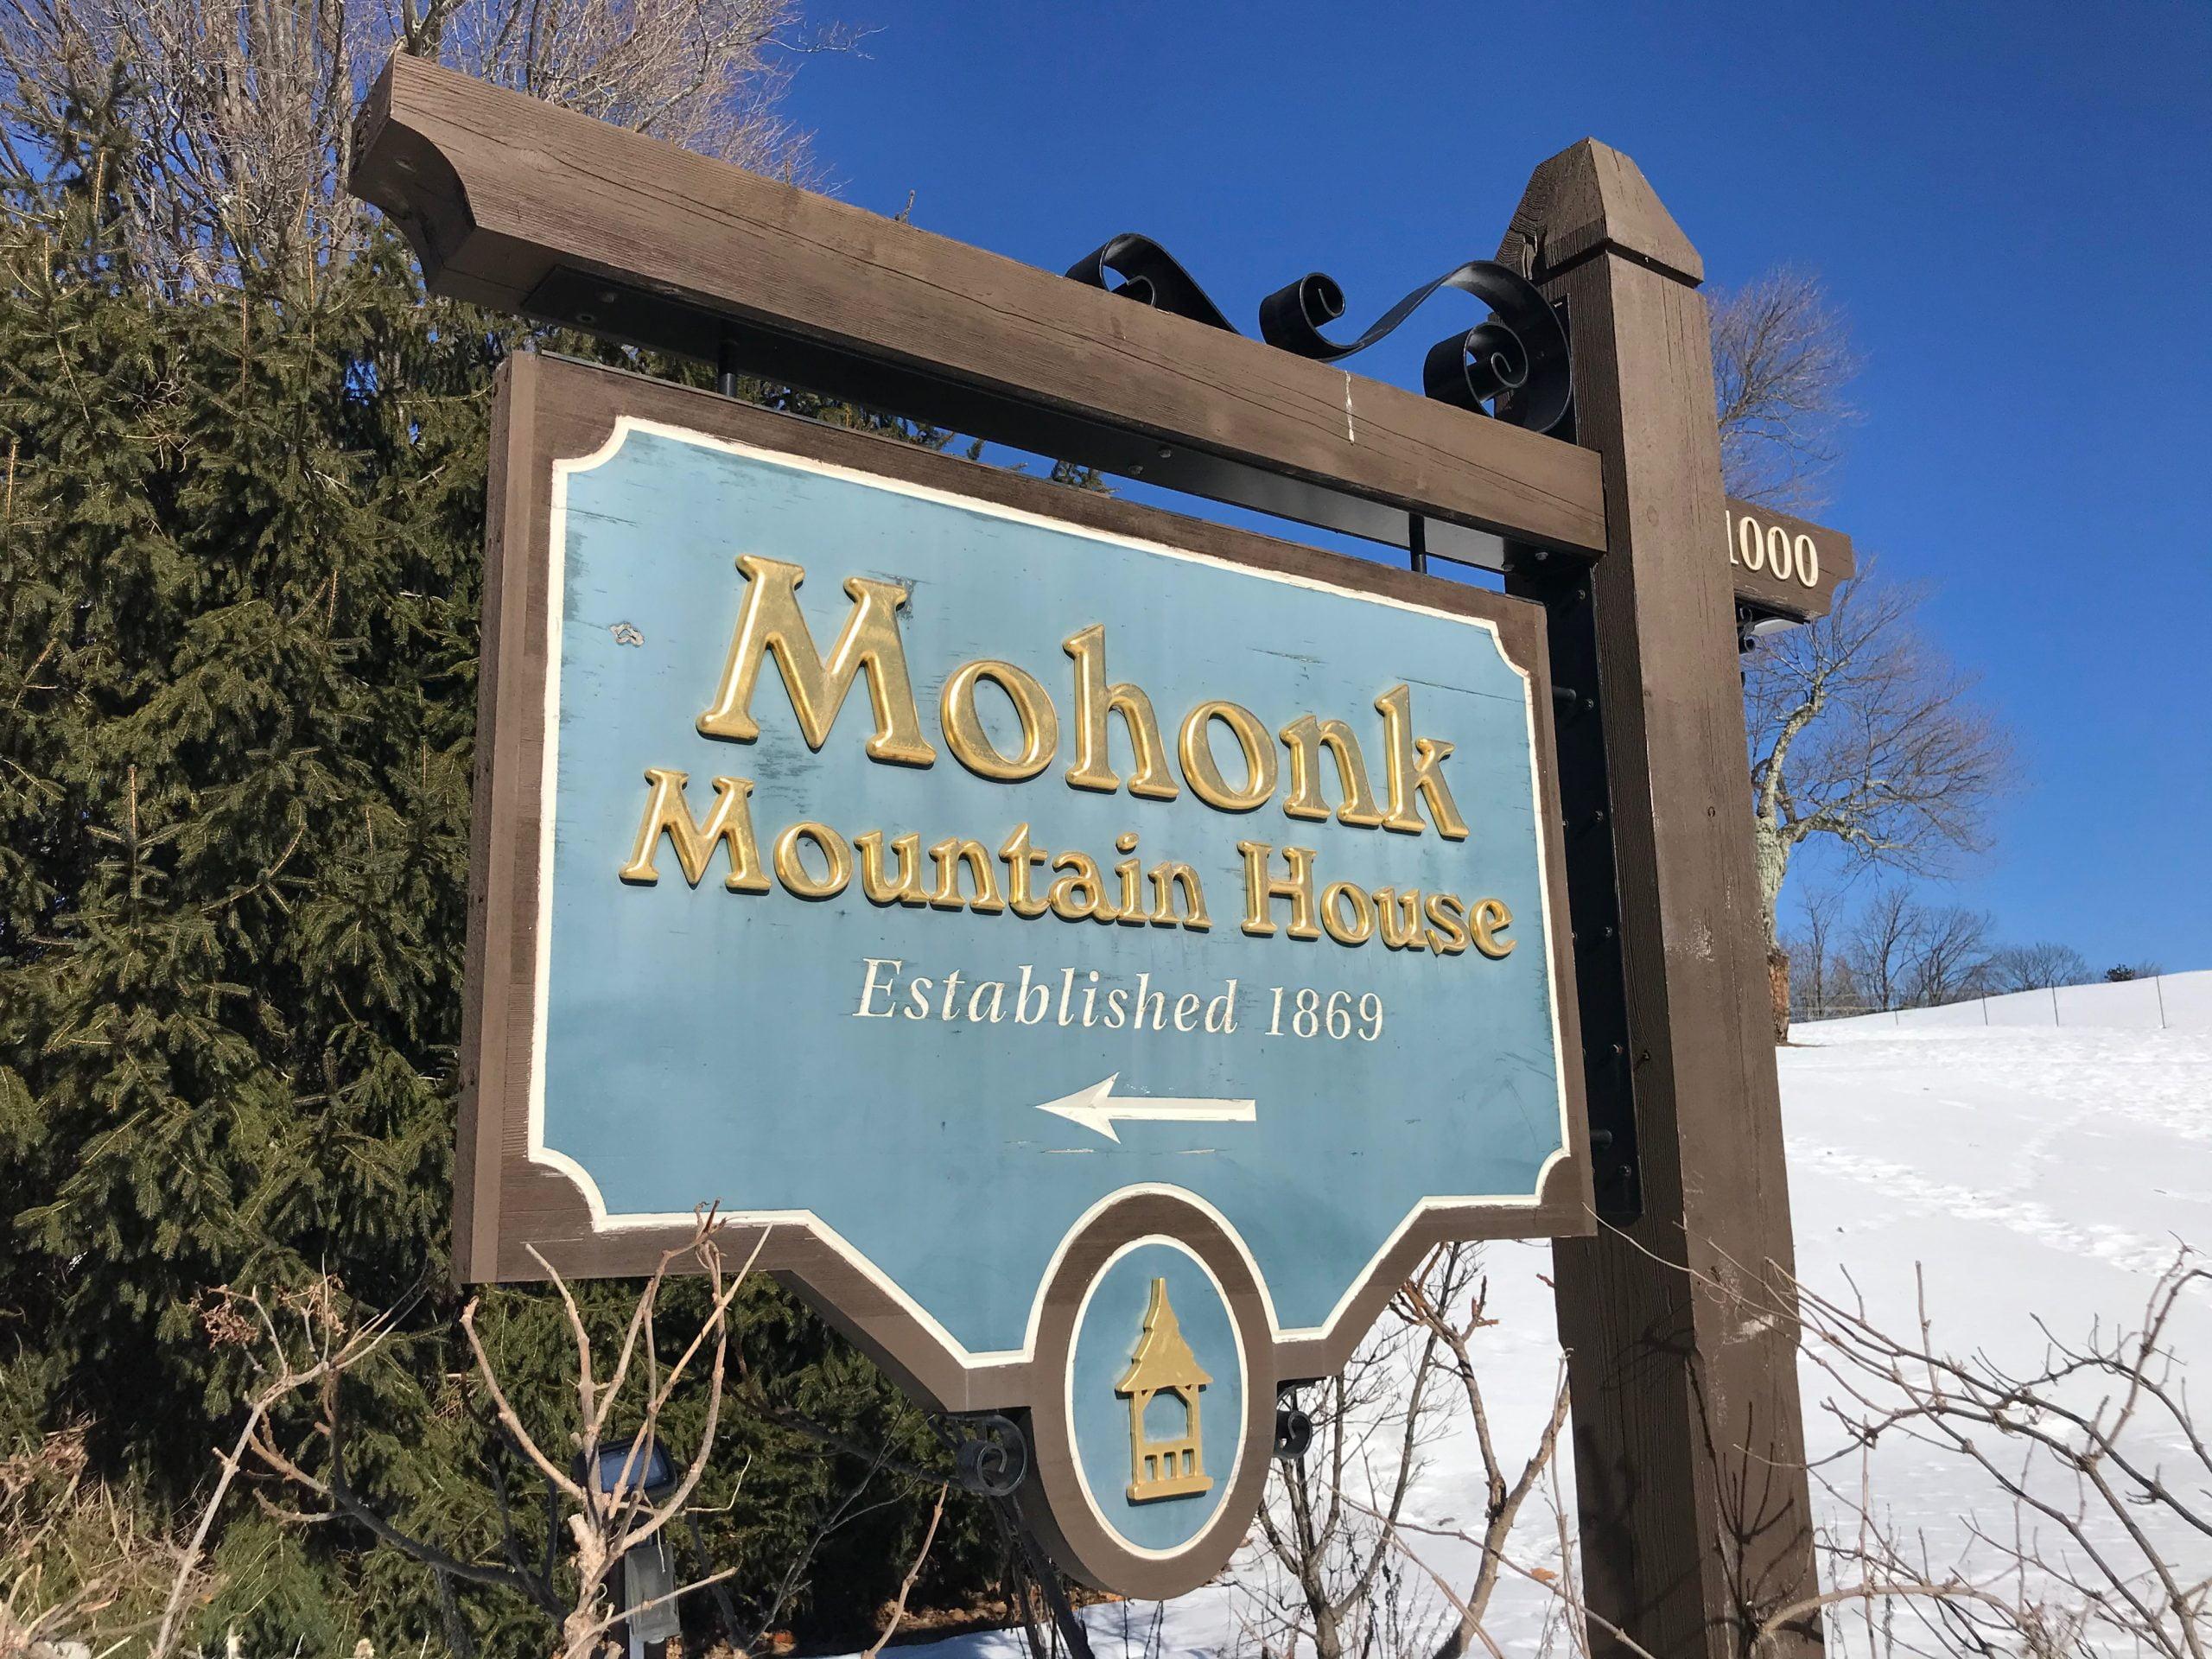 Mohonk Mountain House